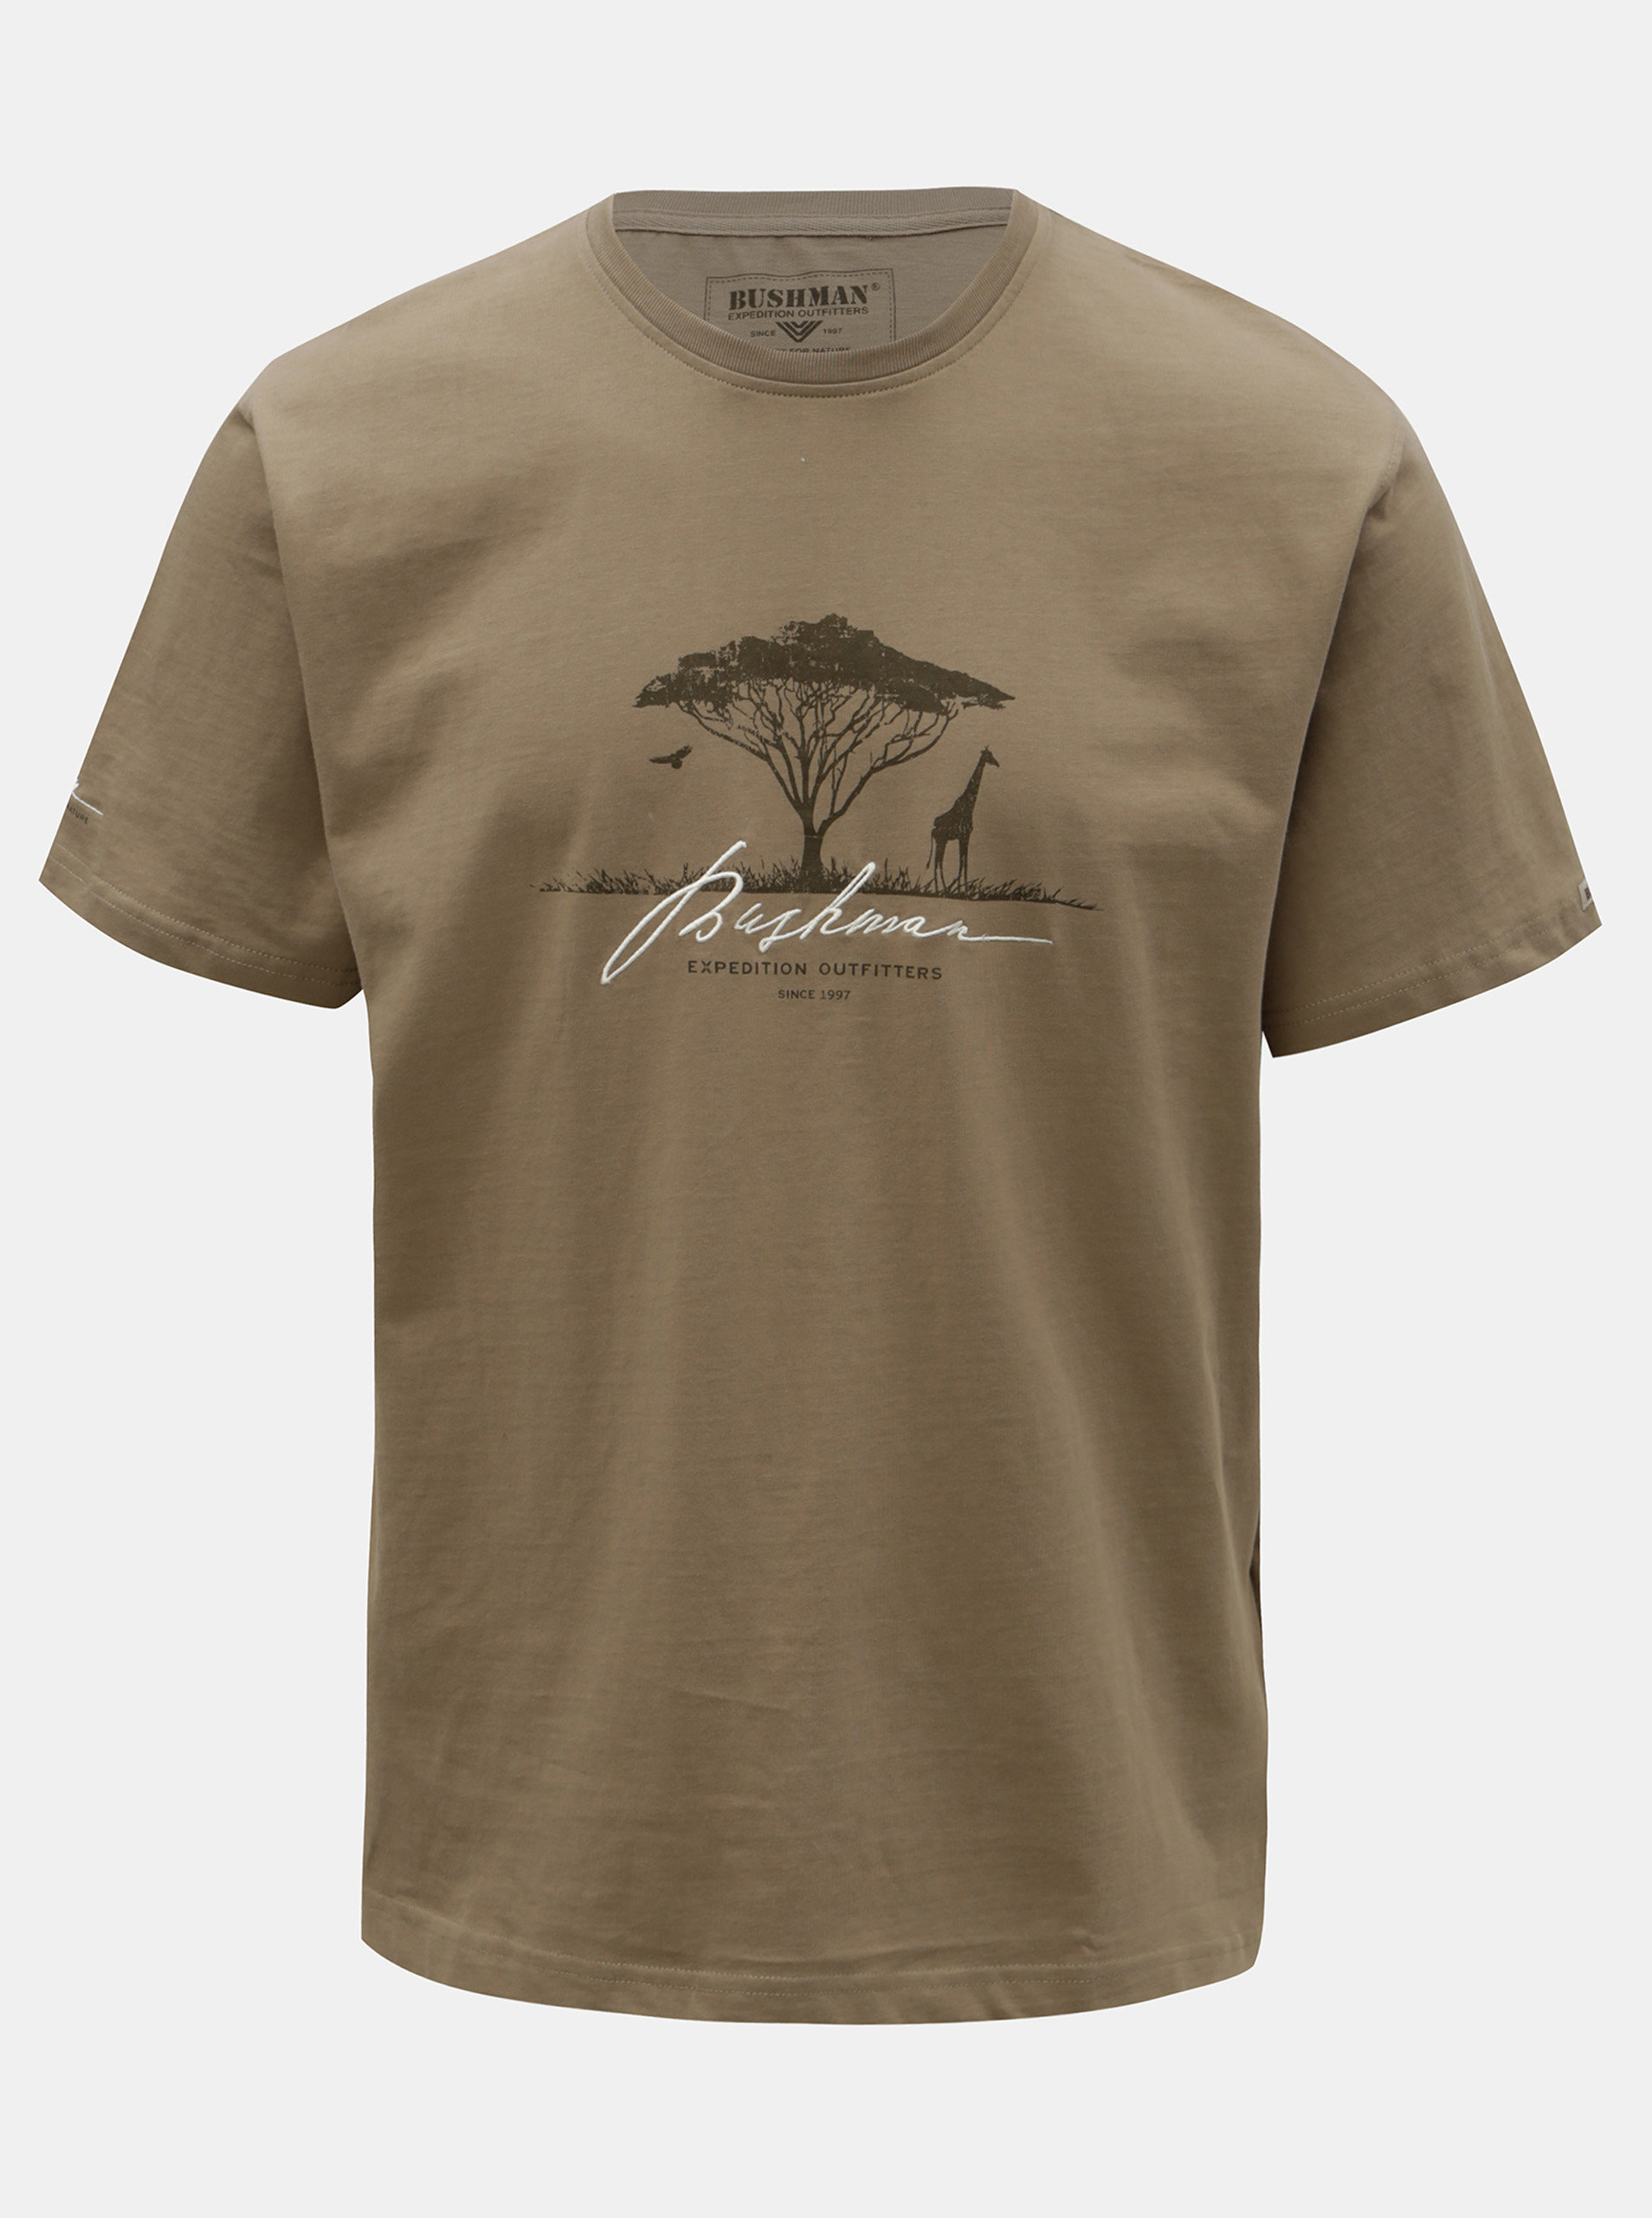 Pánské khaki tričko s potiskem BUSHMAN Parshall